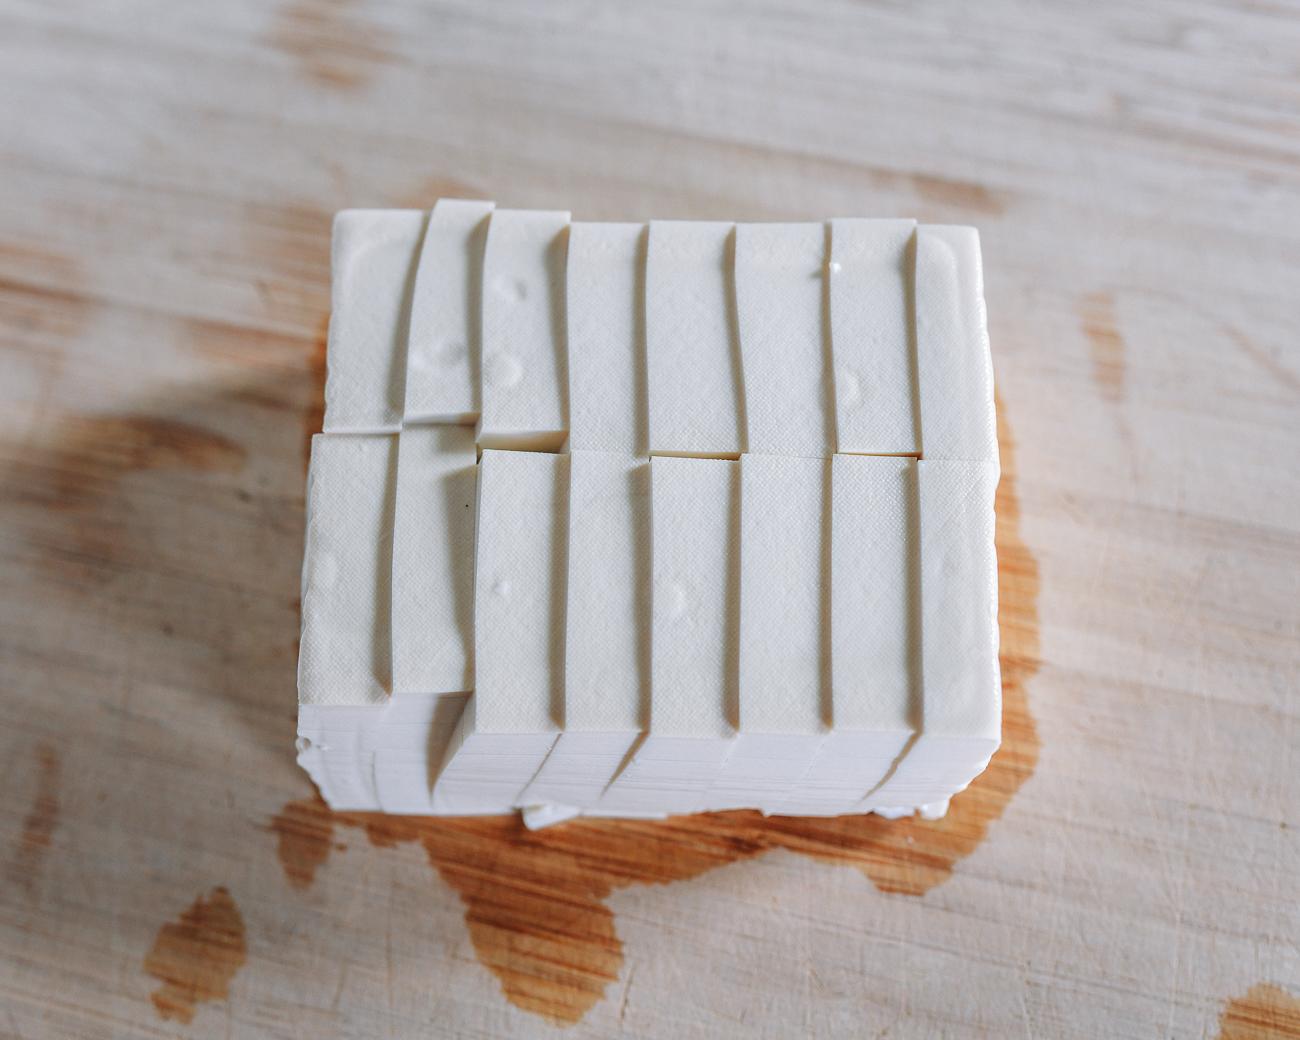 Sliced block of soft tofu